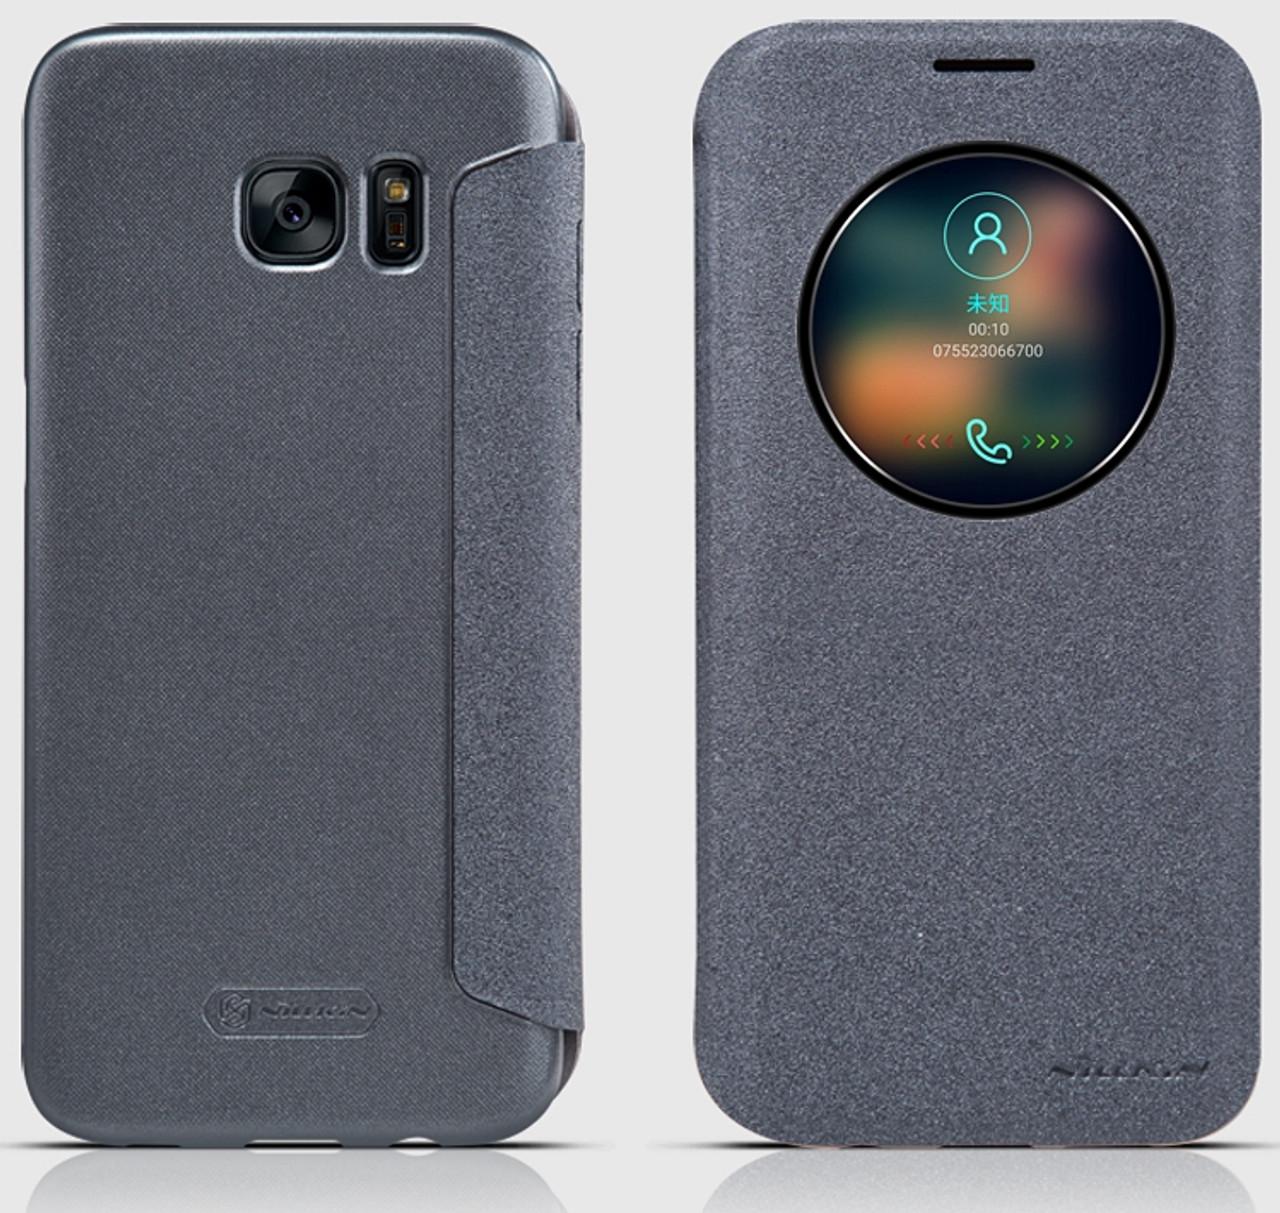 official photos c2ab1 c3bc2 Nillkin Samsung Galaxy S7 EDGE App Window Smart Case